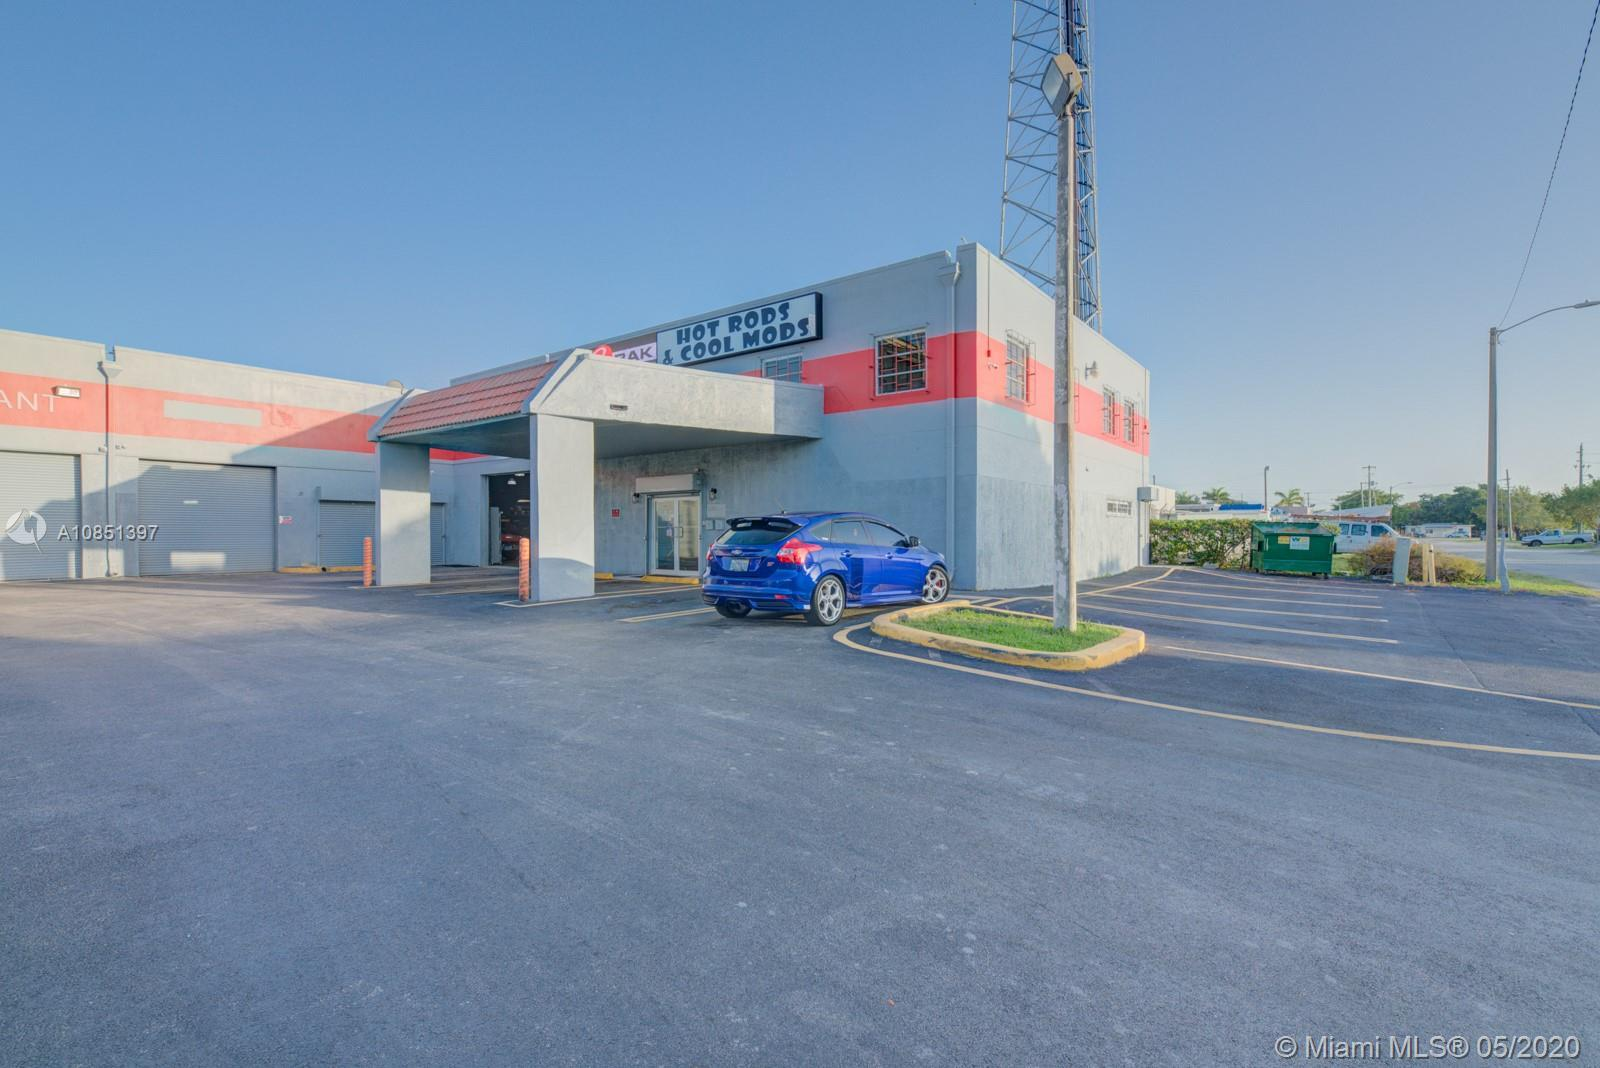 10409 SW 186 St, Cutler Bay, FL, 33157